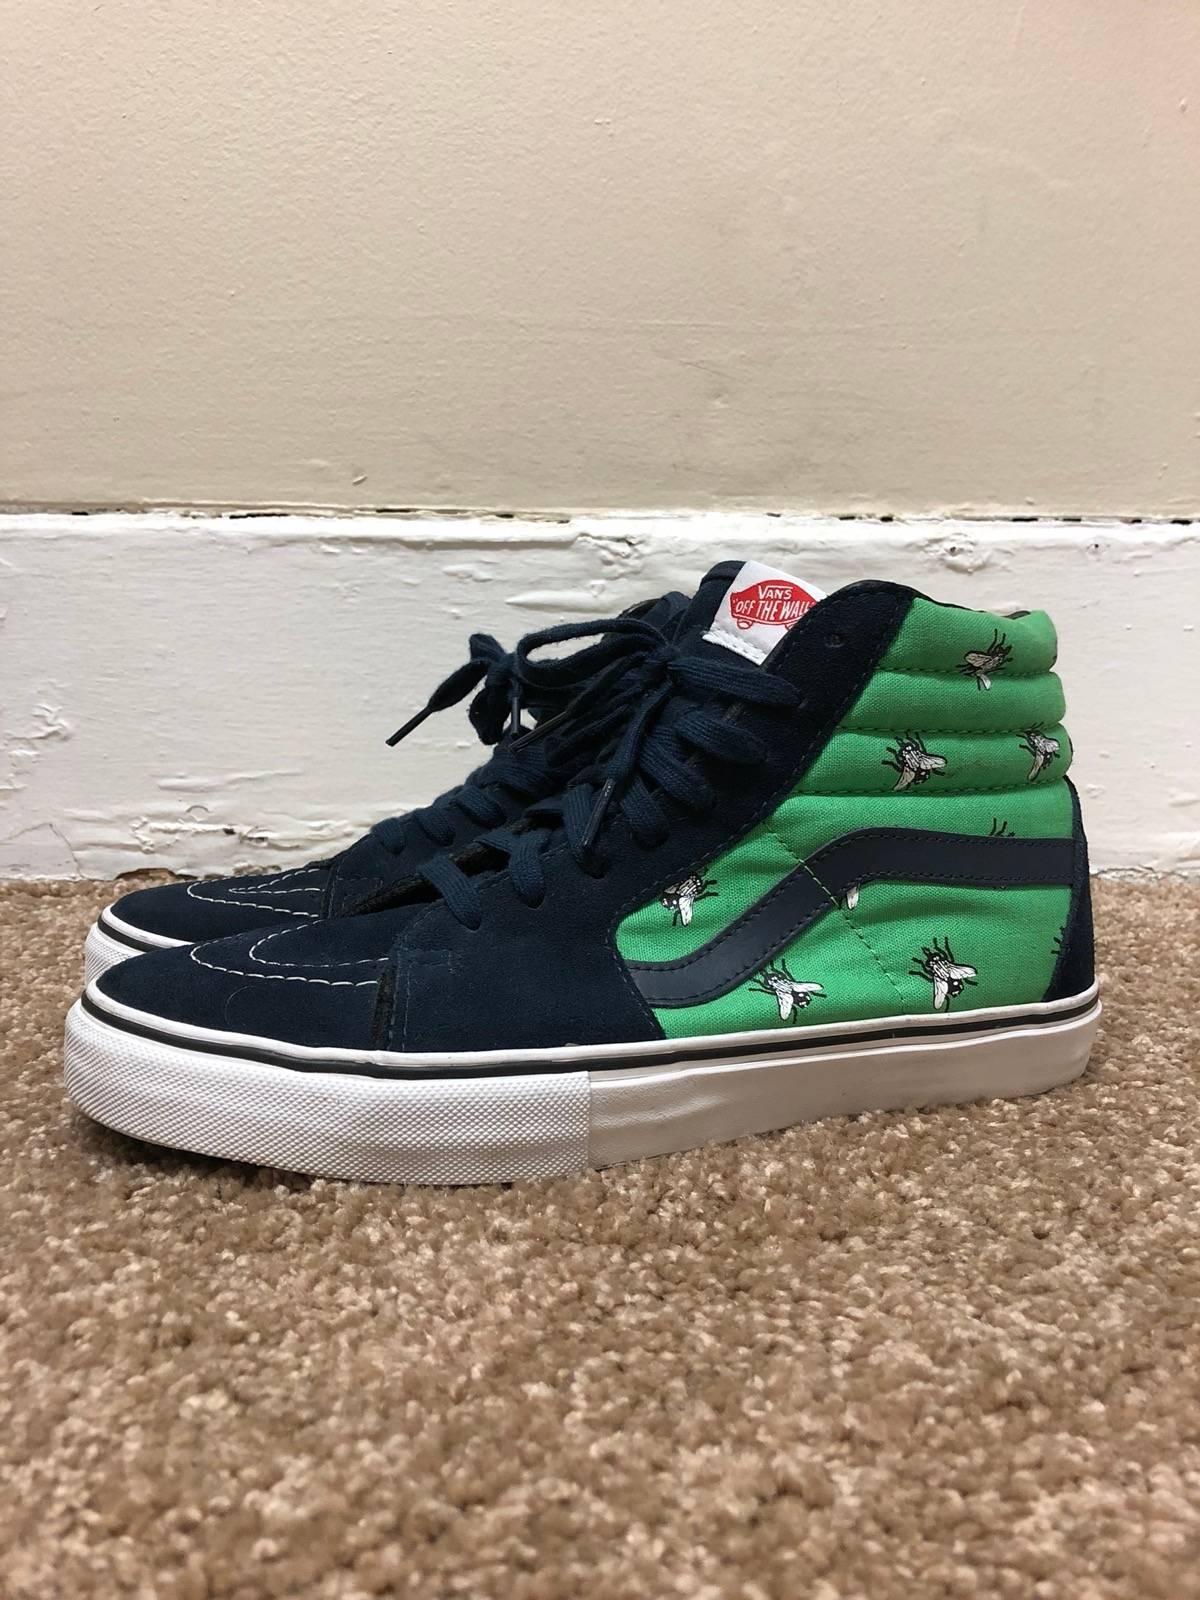 eb945121b9f07b Supreme Supreme Vans Flies Sk8 Hi Navy Green Size 9 - Hi-Top Sneakers for  Sale - Grailed